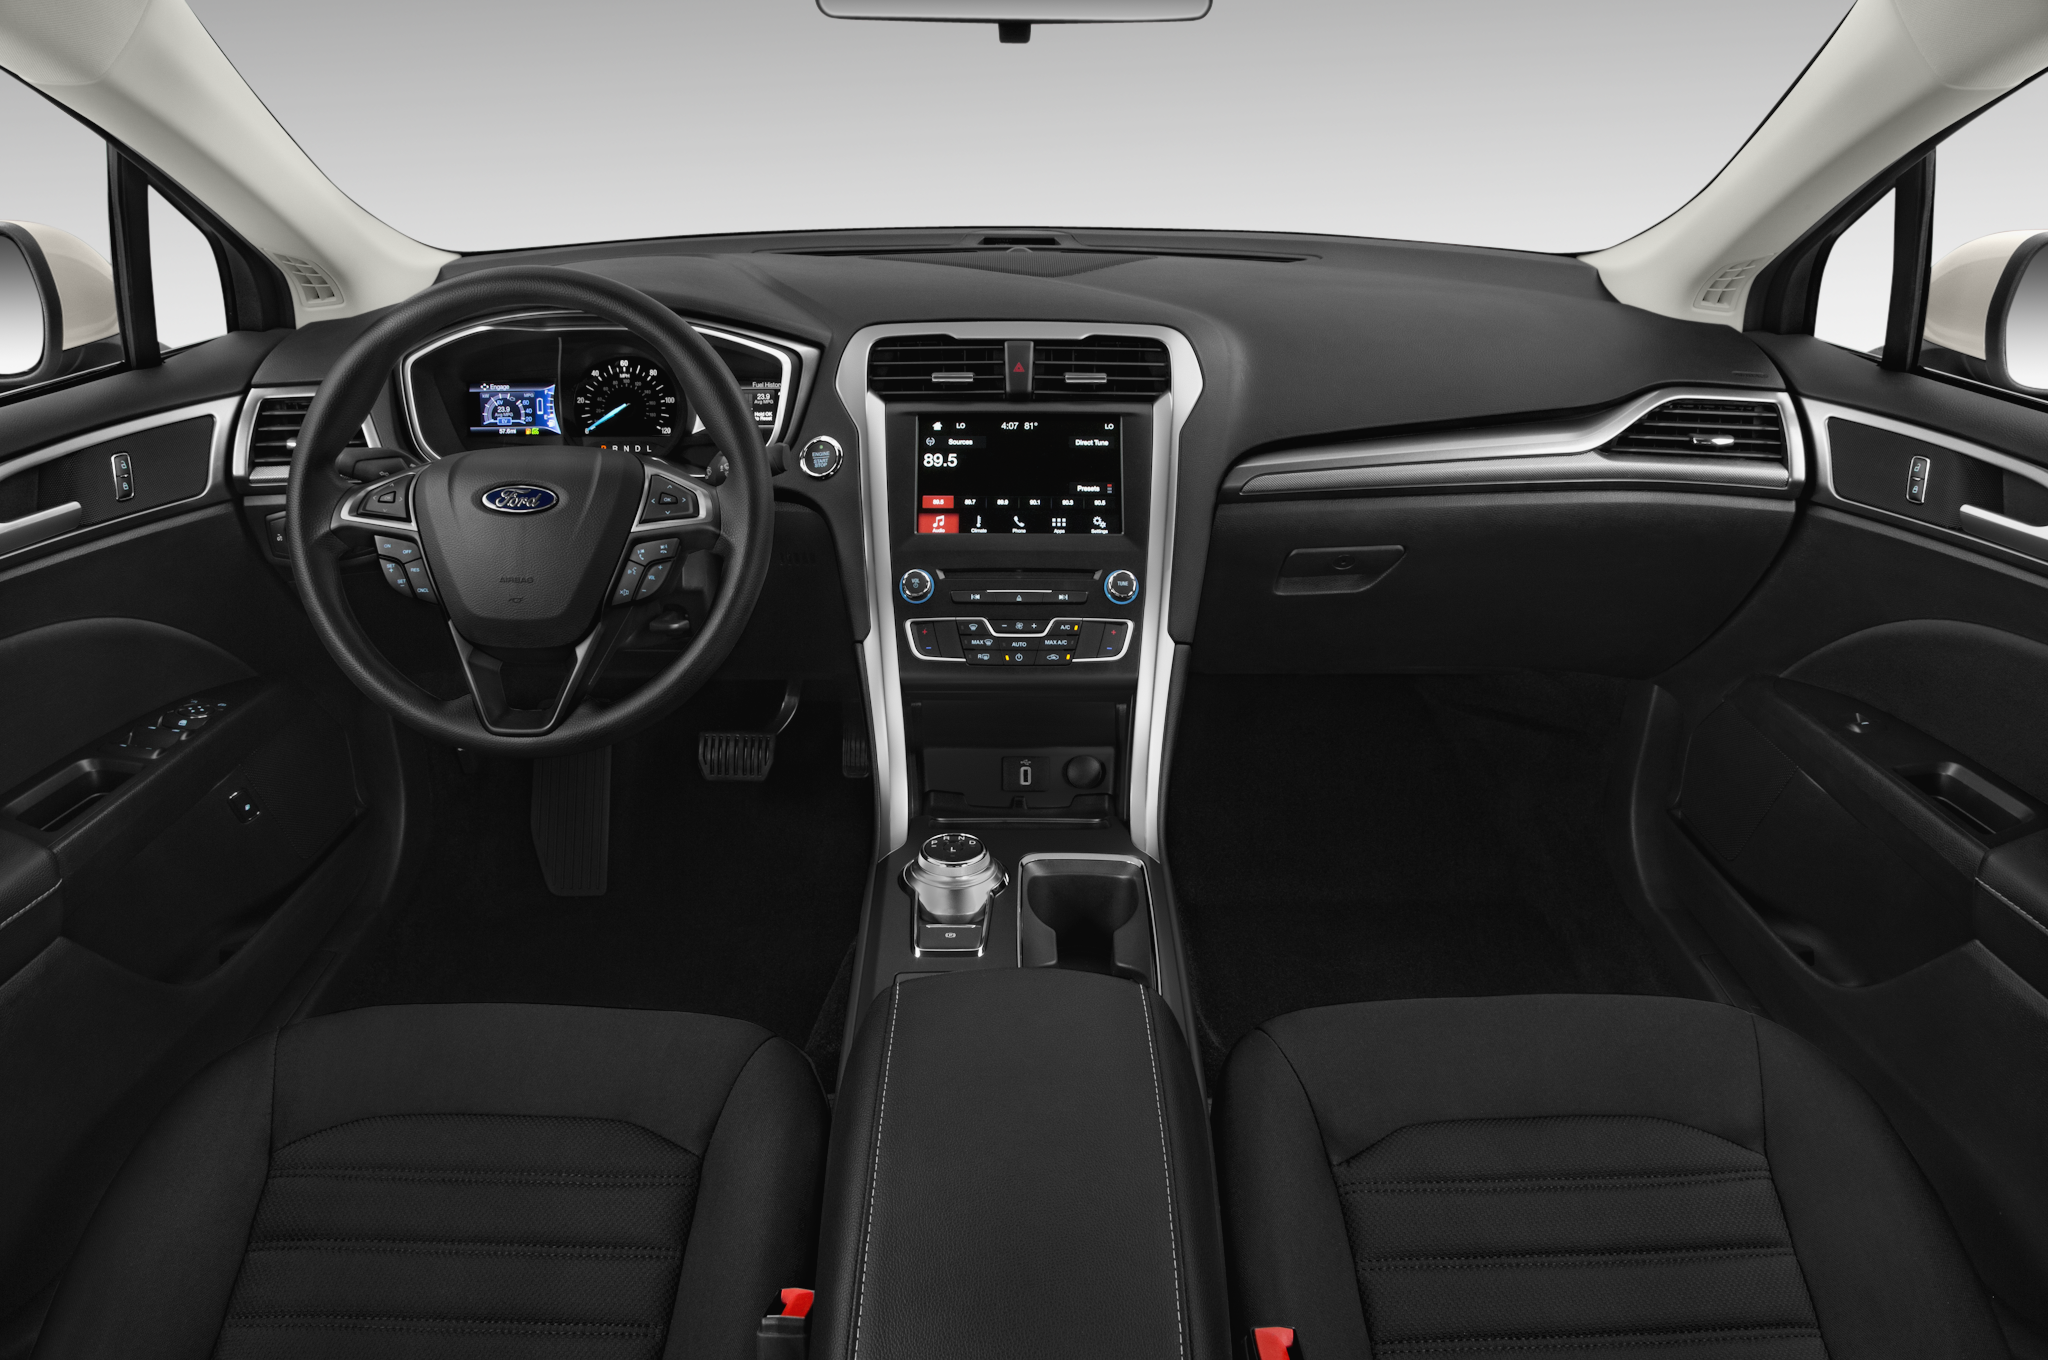 Updated Ford Fusion Hybrid Autonomous Car Looks Sleek